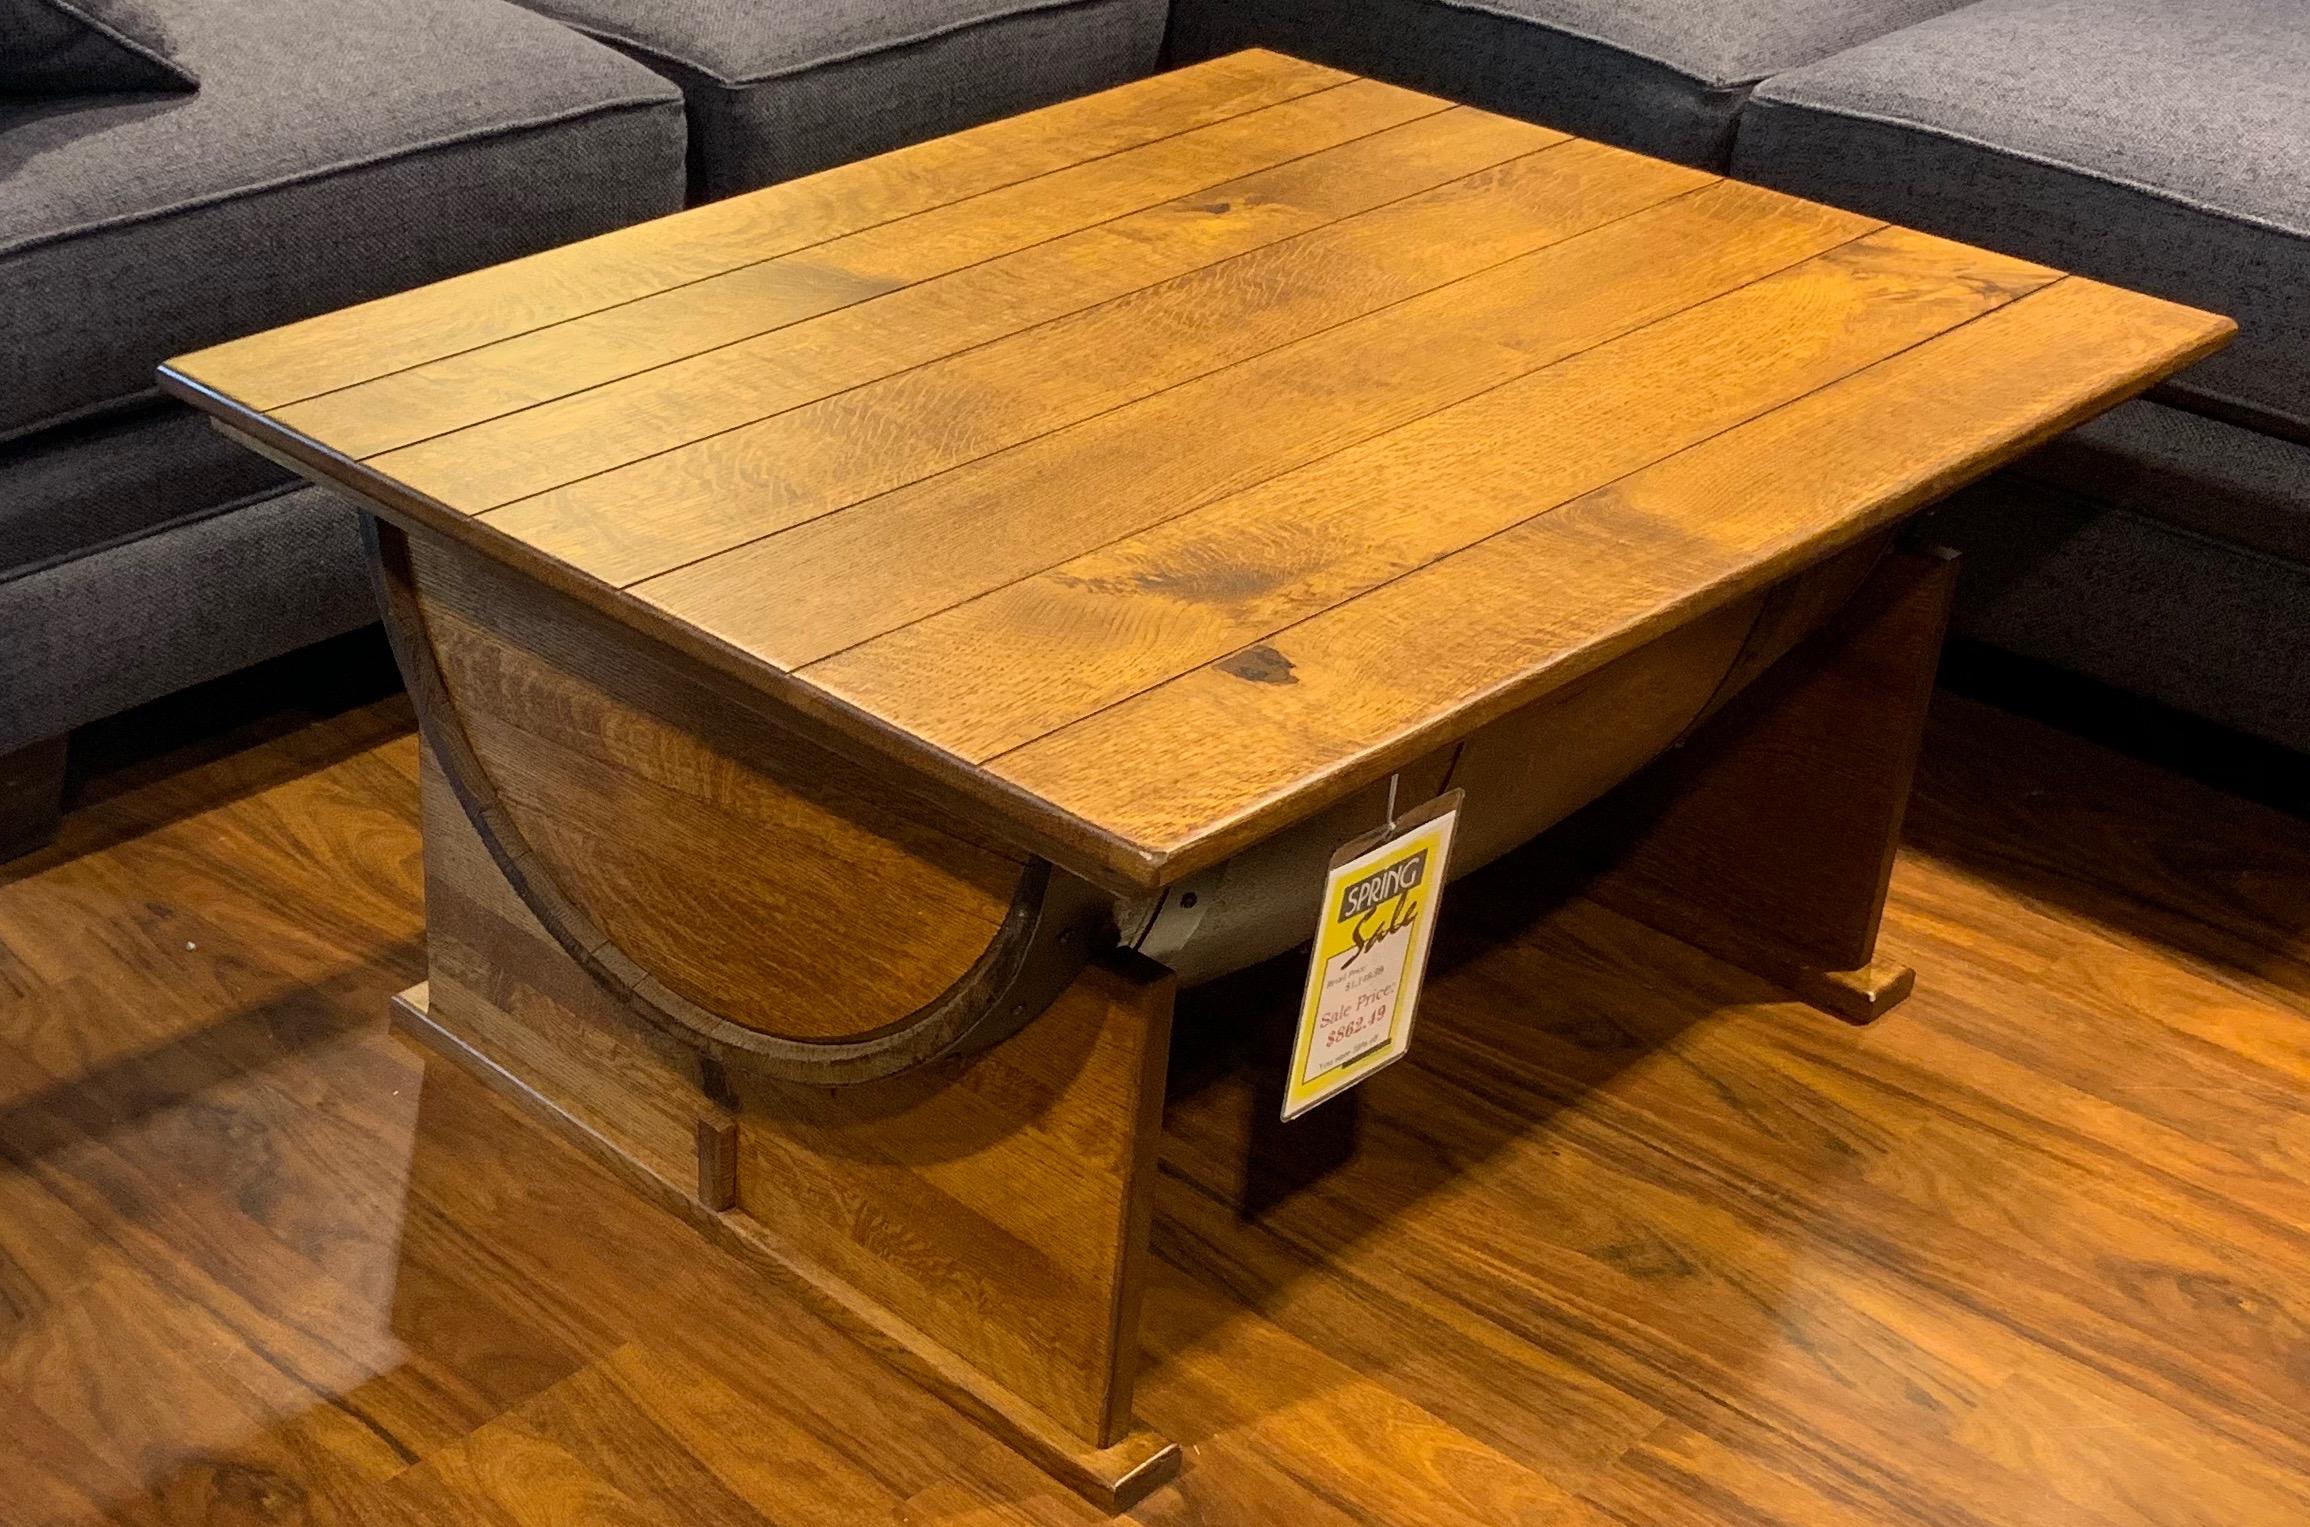 Half Barrel Lift-Top Coffee Table 165-